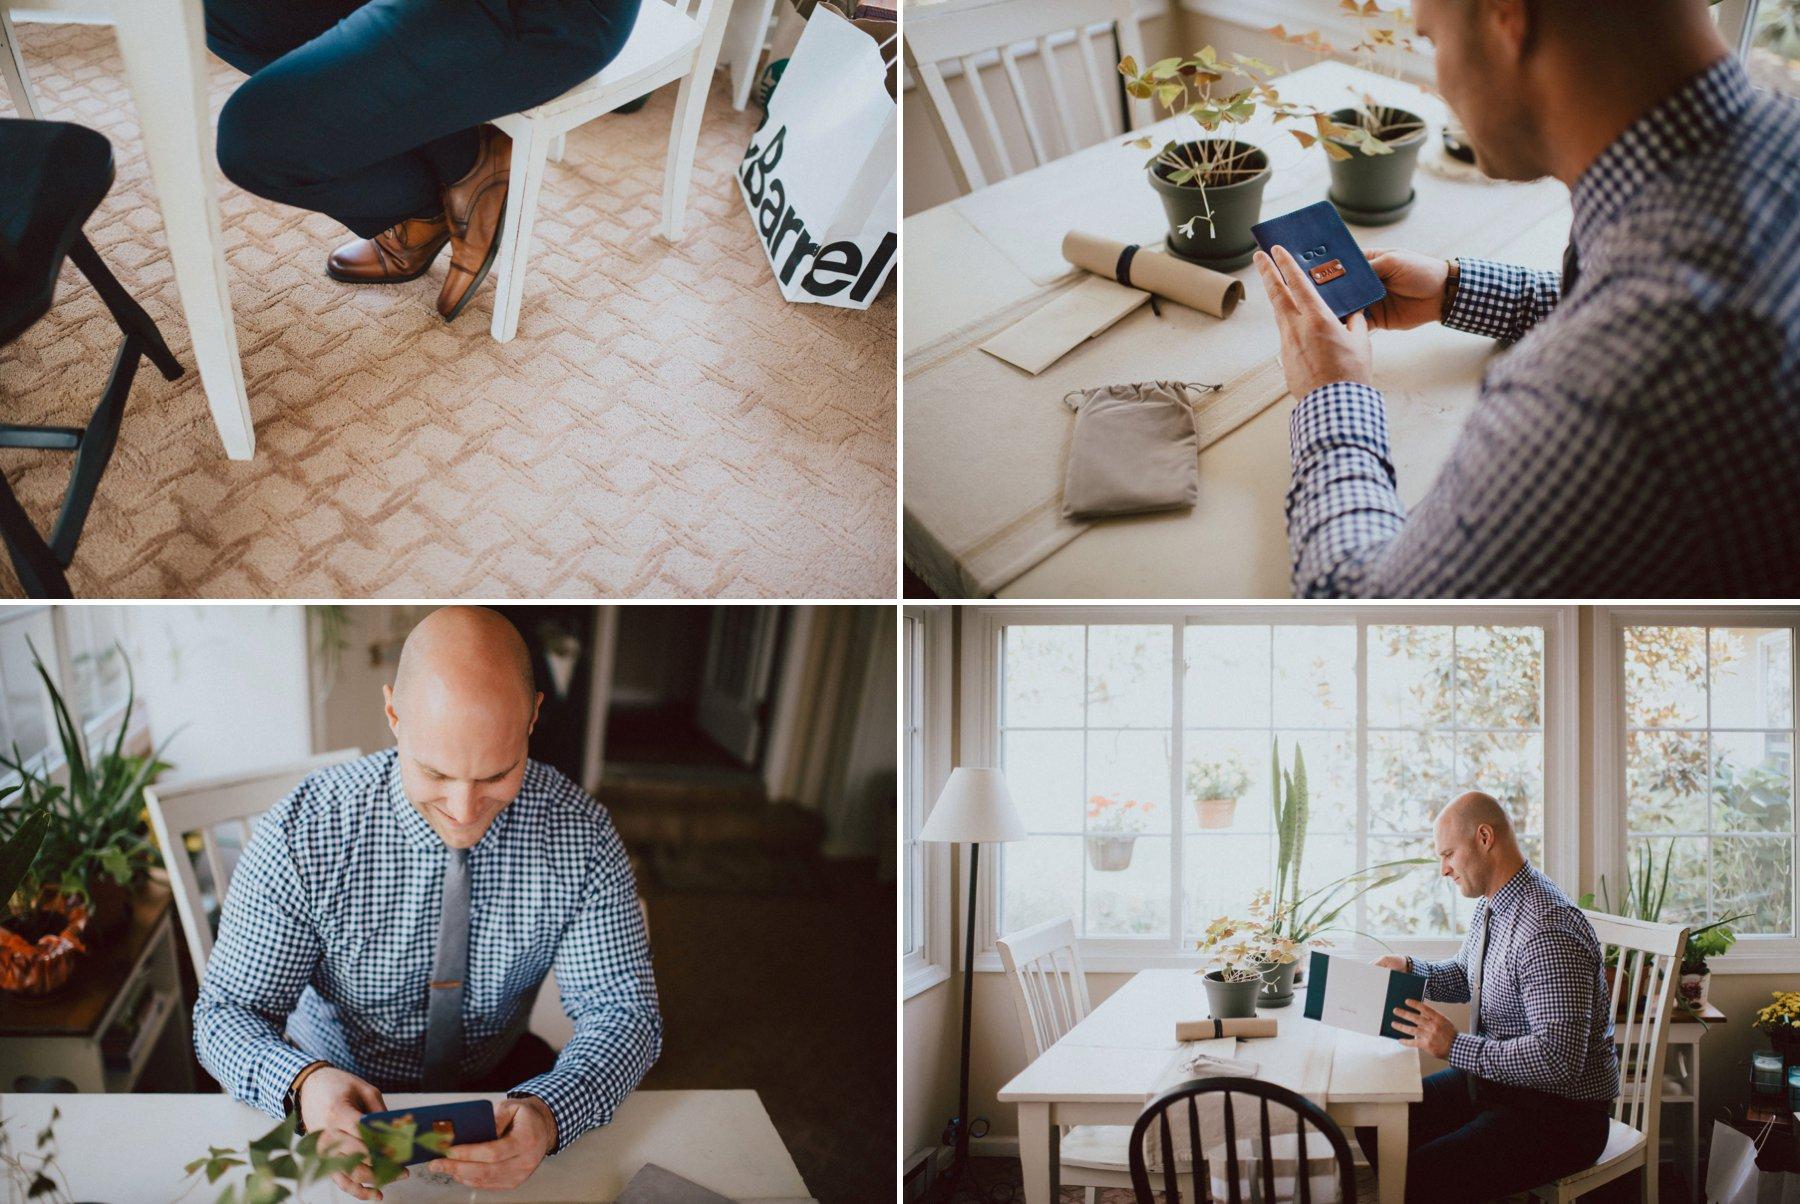 faunbrook-bed-and-breakfast-wedding-37.jpg